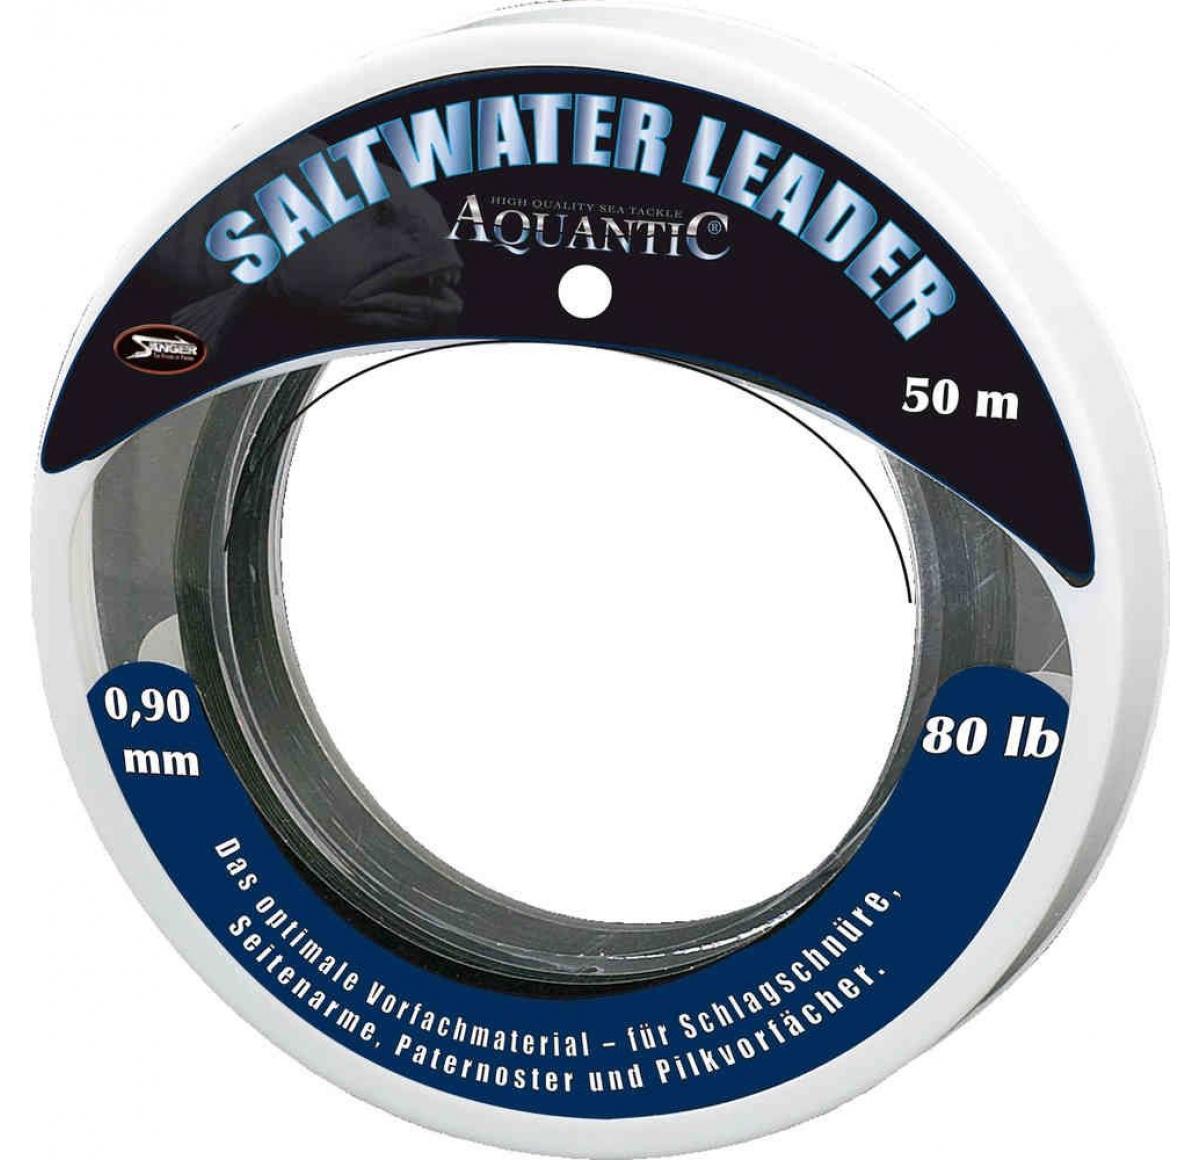 AQUANTIC Saltwater Leader 1.00mm 50m